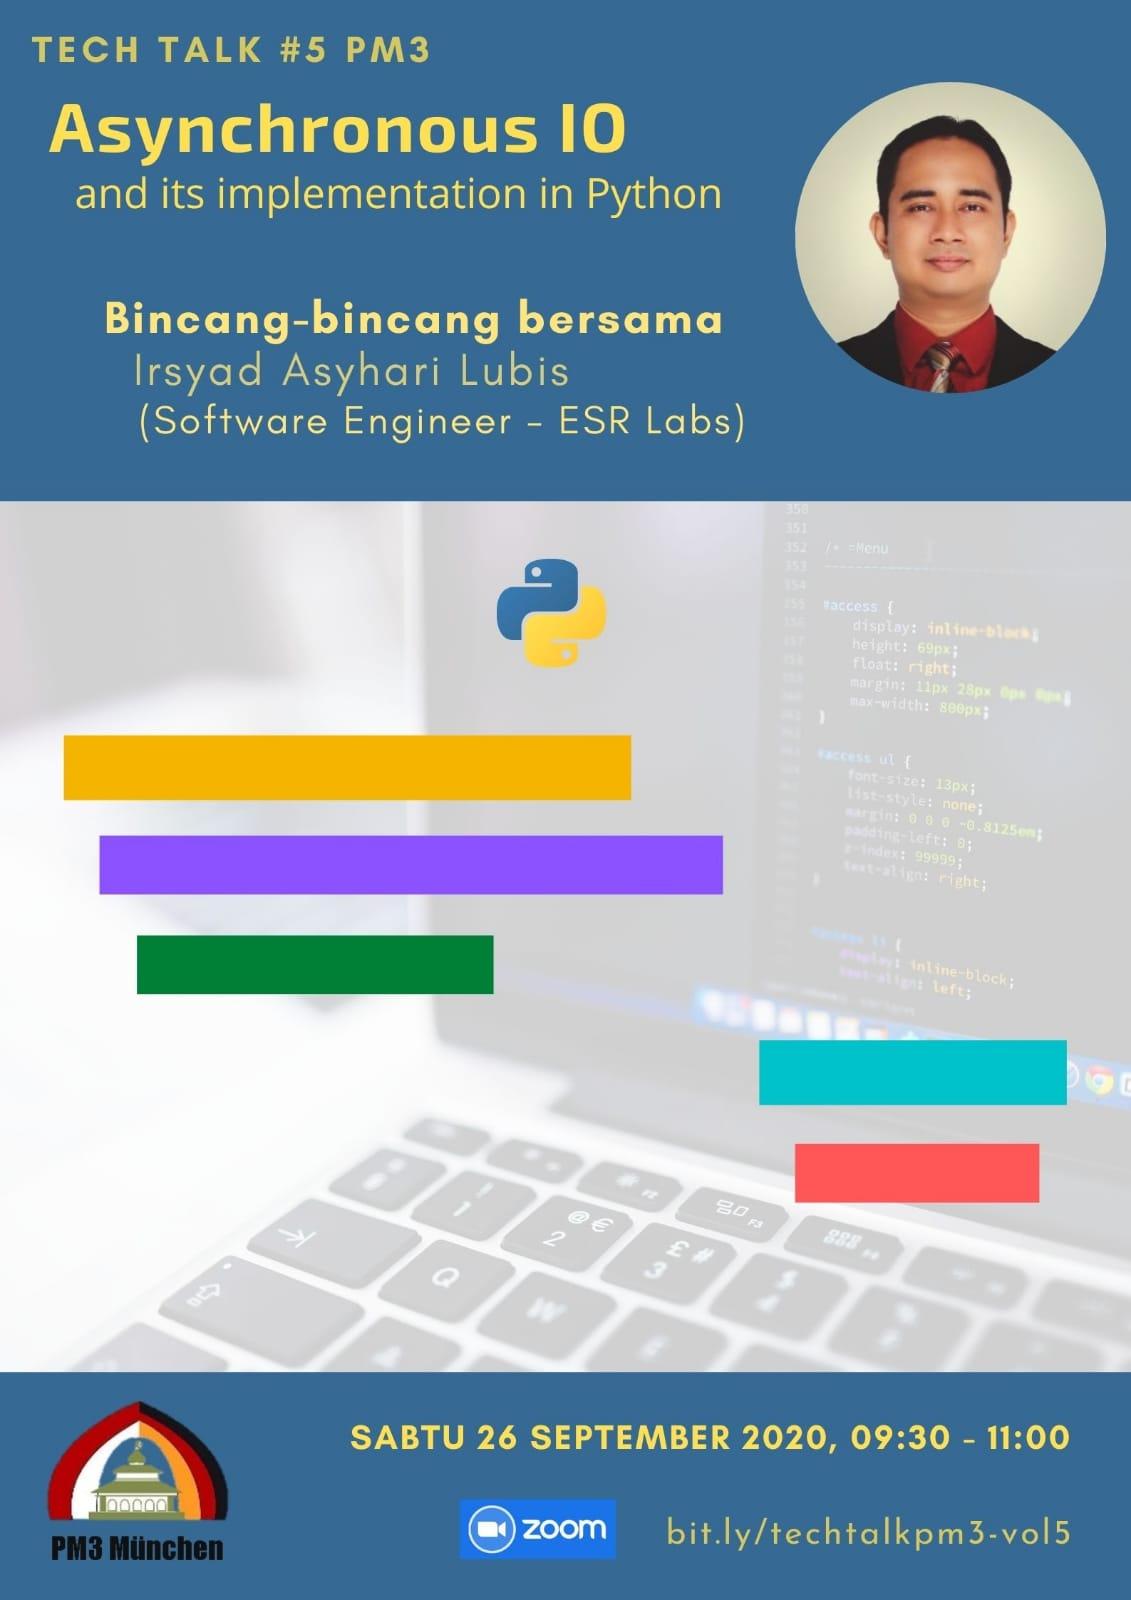 Tech Talk #5